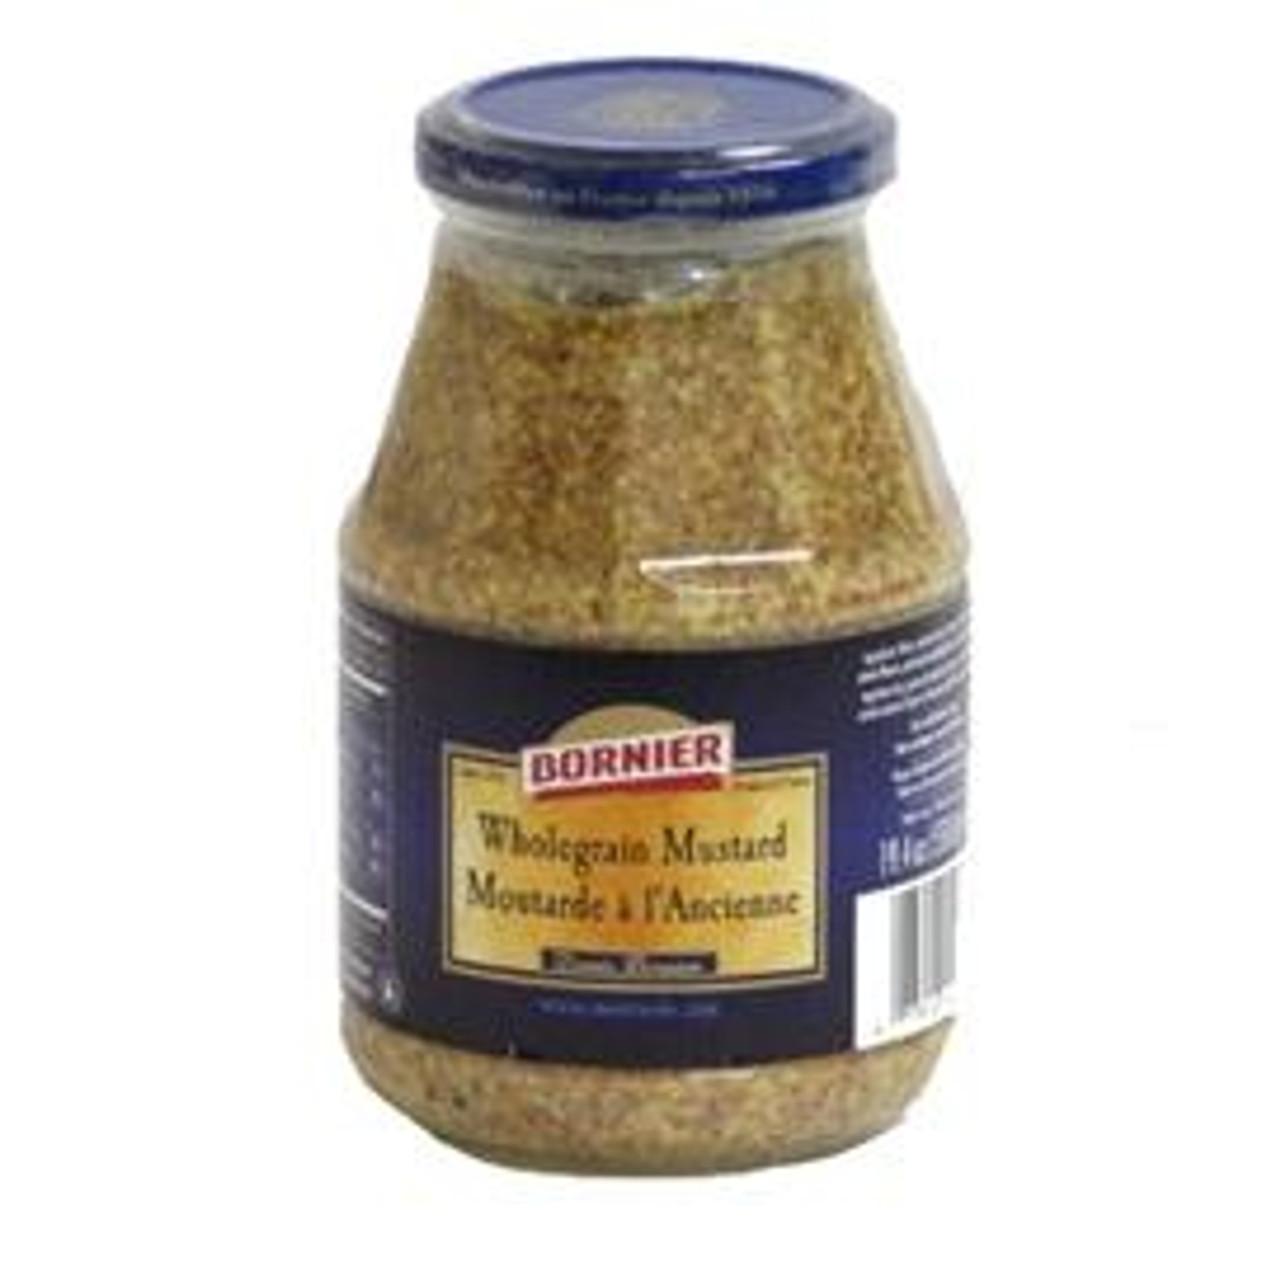 Wholegrain Mustard